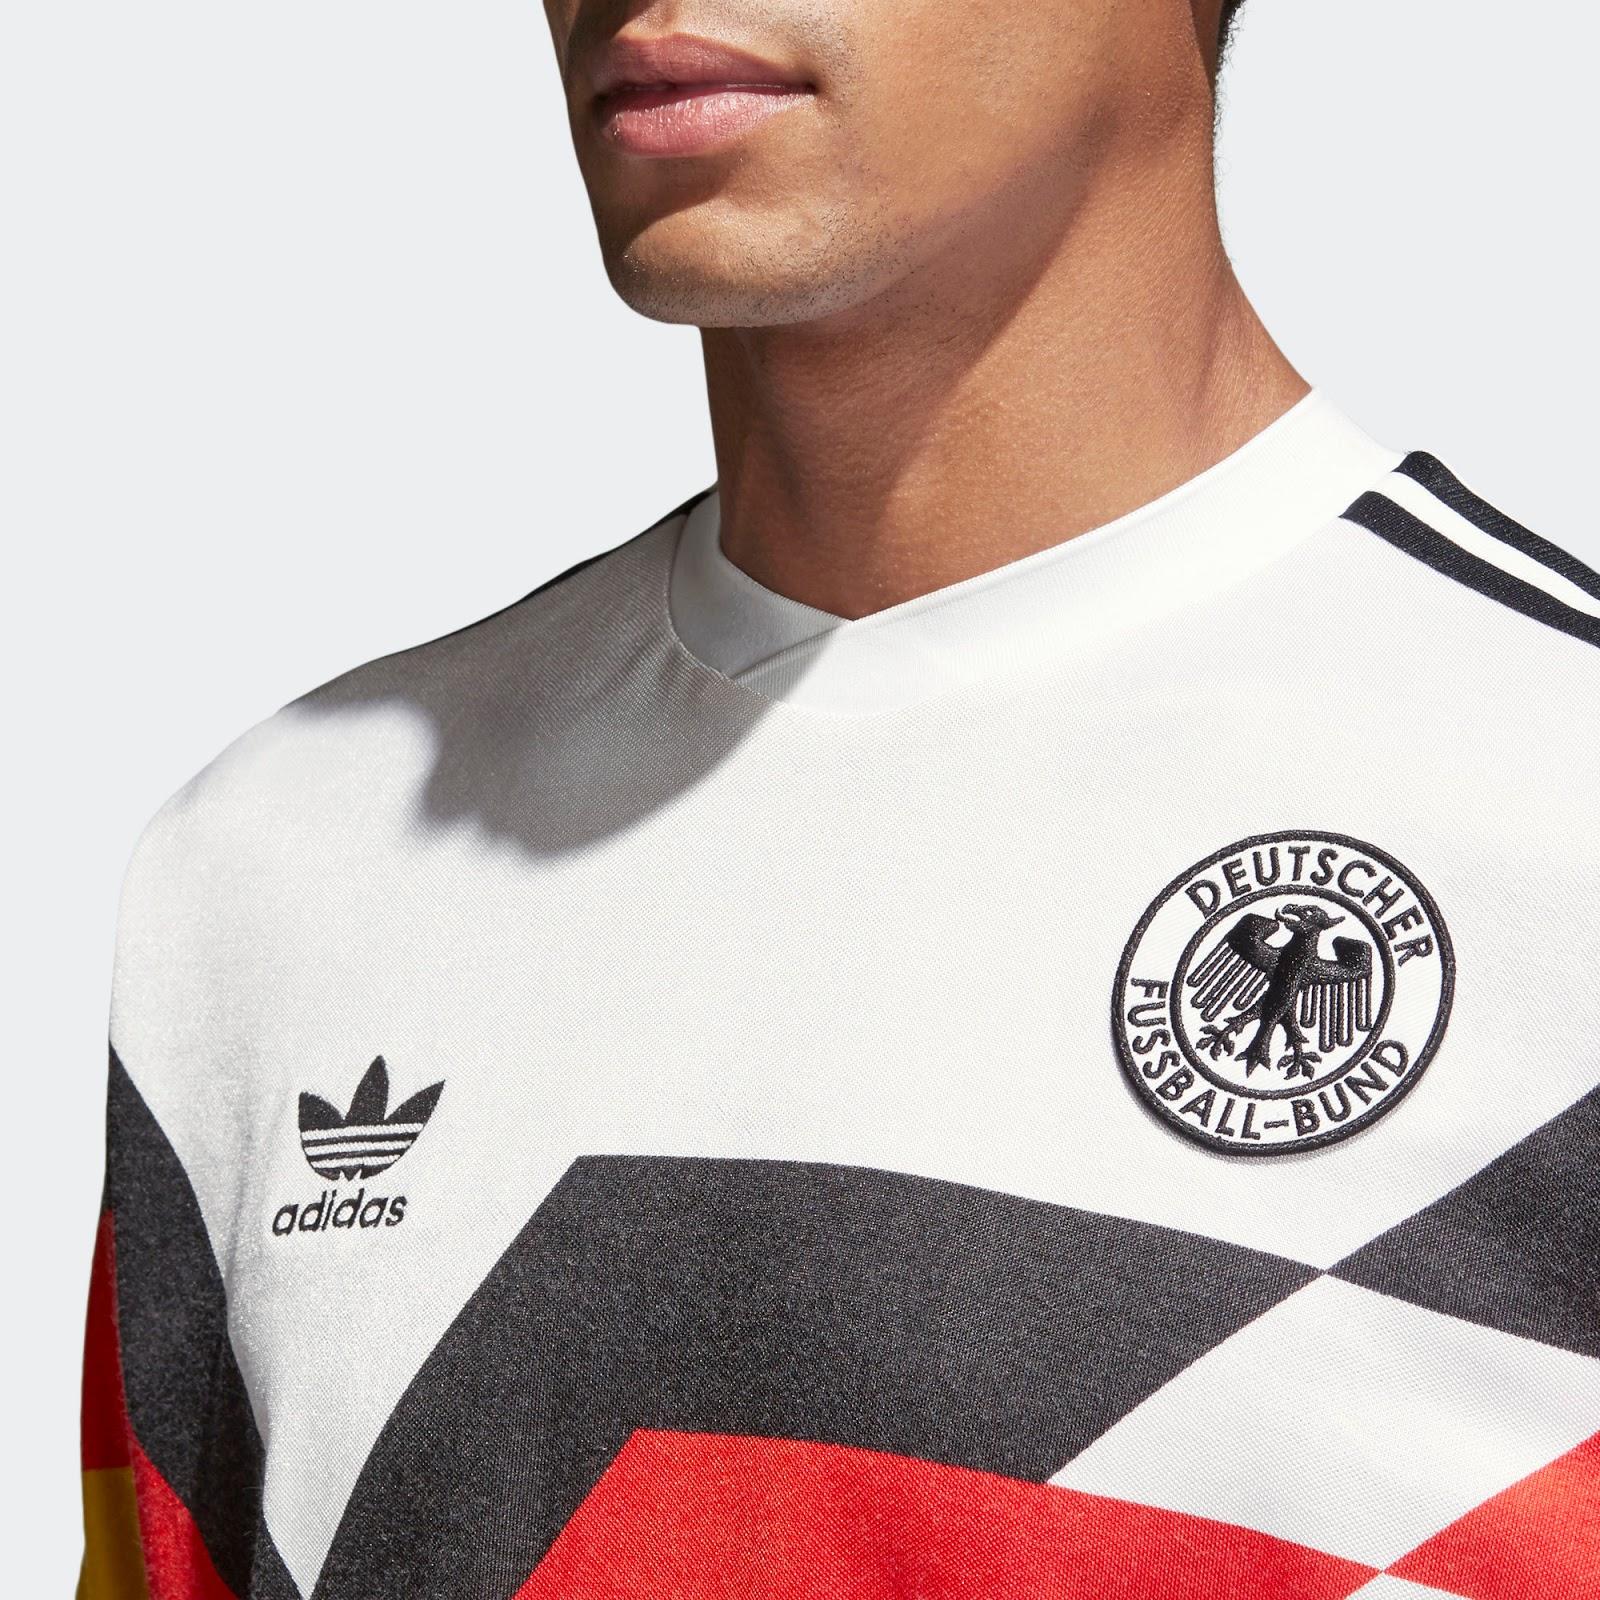 9ecba0f0d6c Adidas Originals Argentina